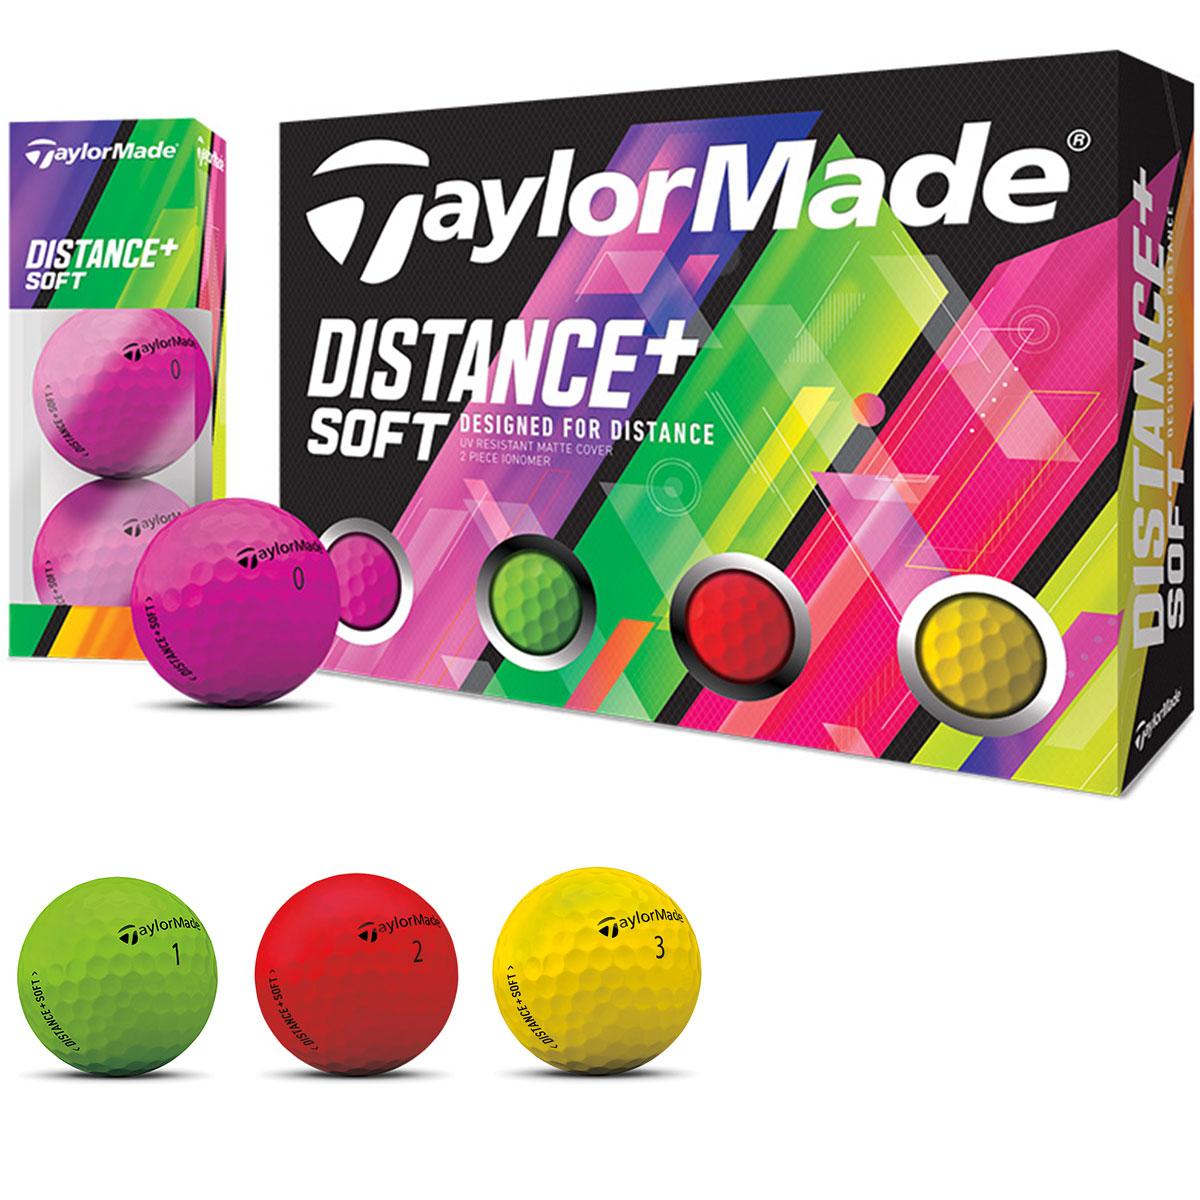 DISTANCE+ ソフト マルチカラーボール